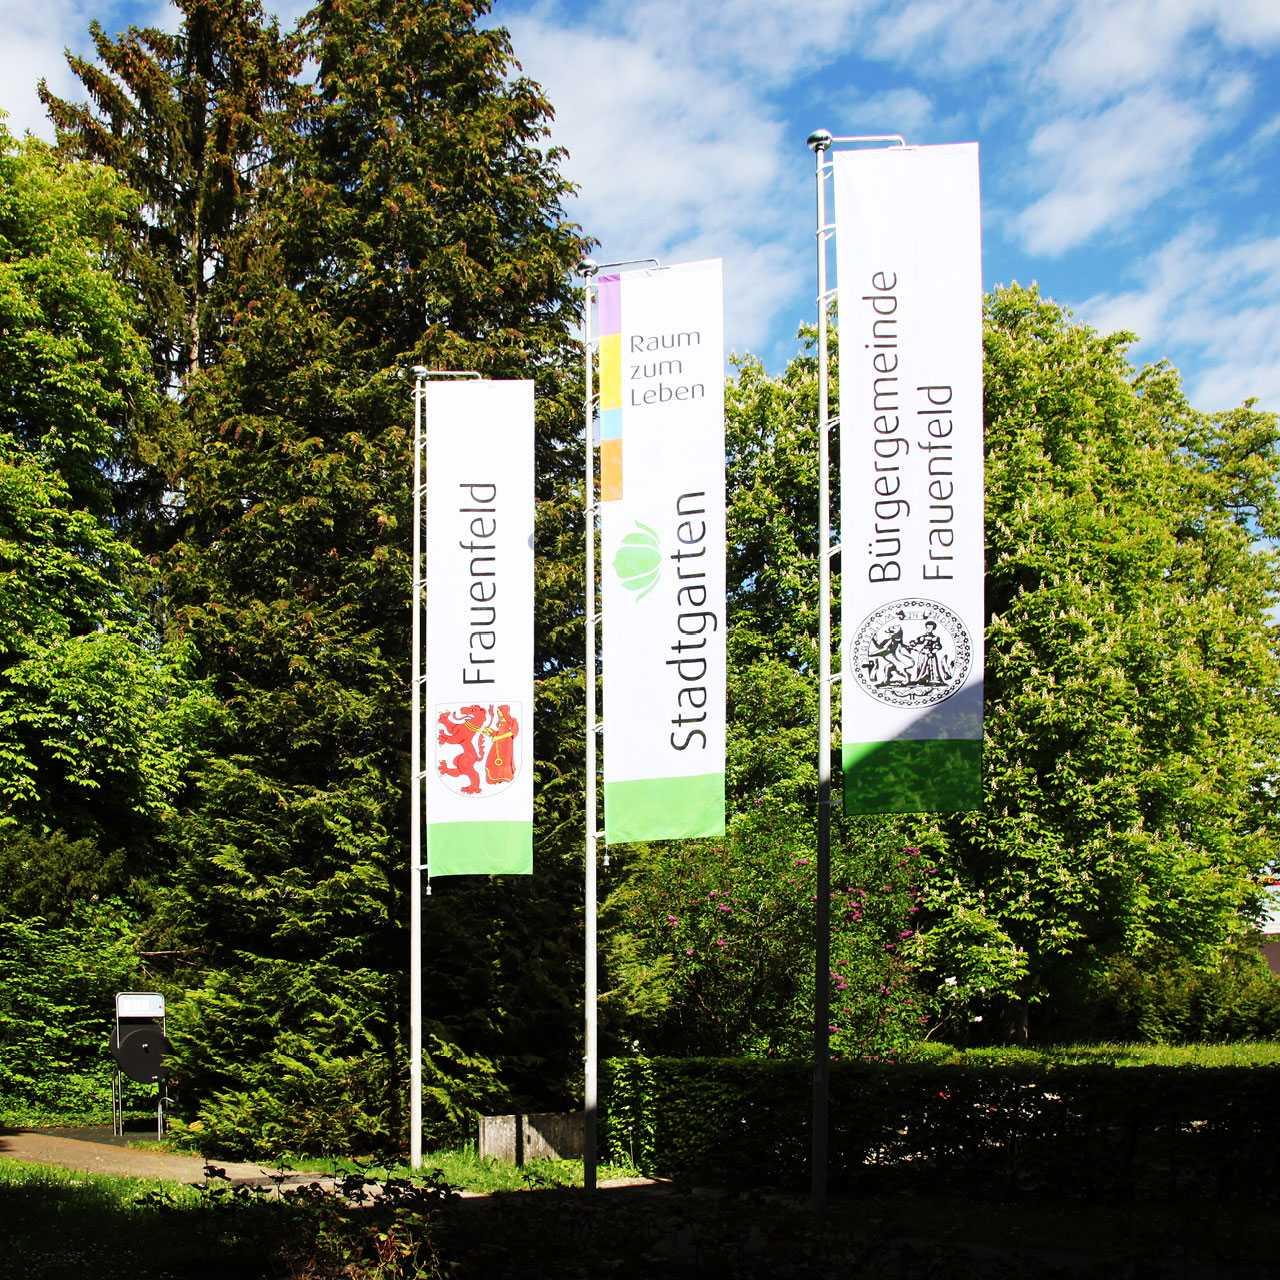 Pflegezentrum Stadtgarten: Signaletik, Fahnen